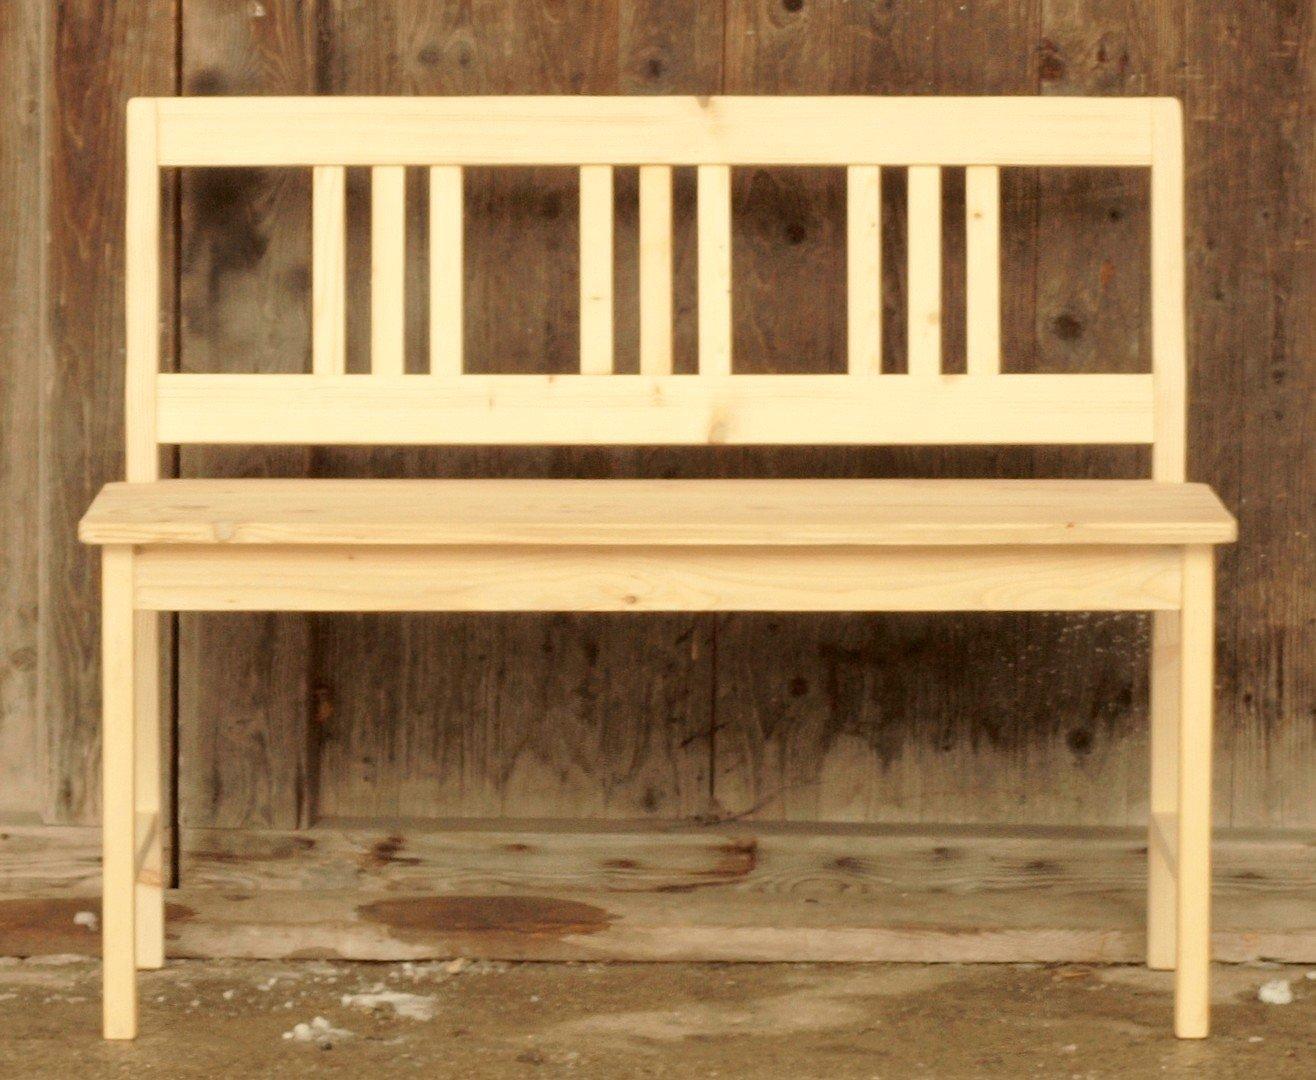 110 cm massive fichtenholz sitzbank bank antik m bel antiquit ten alling bei m nchen zwischen. Black Bedroom Furniture Sets. Home Design Ideas